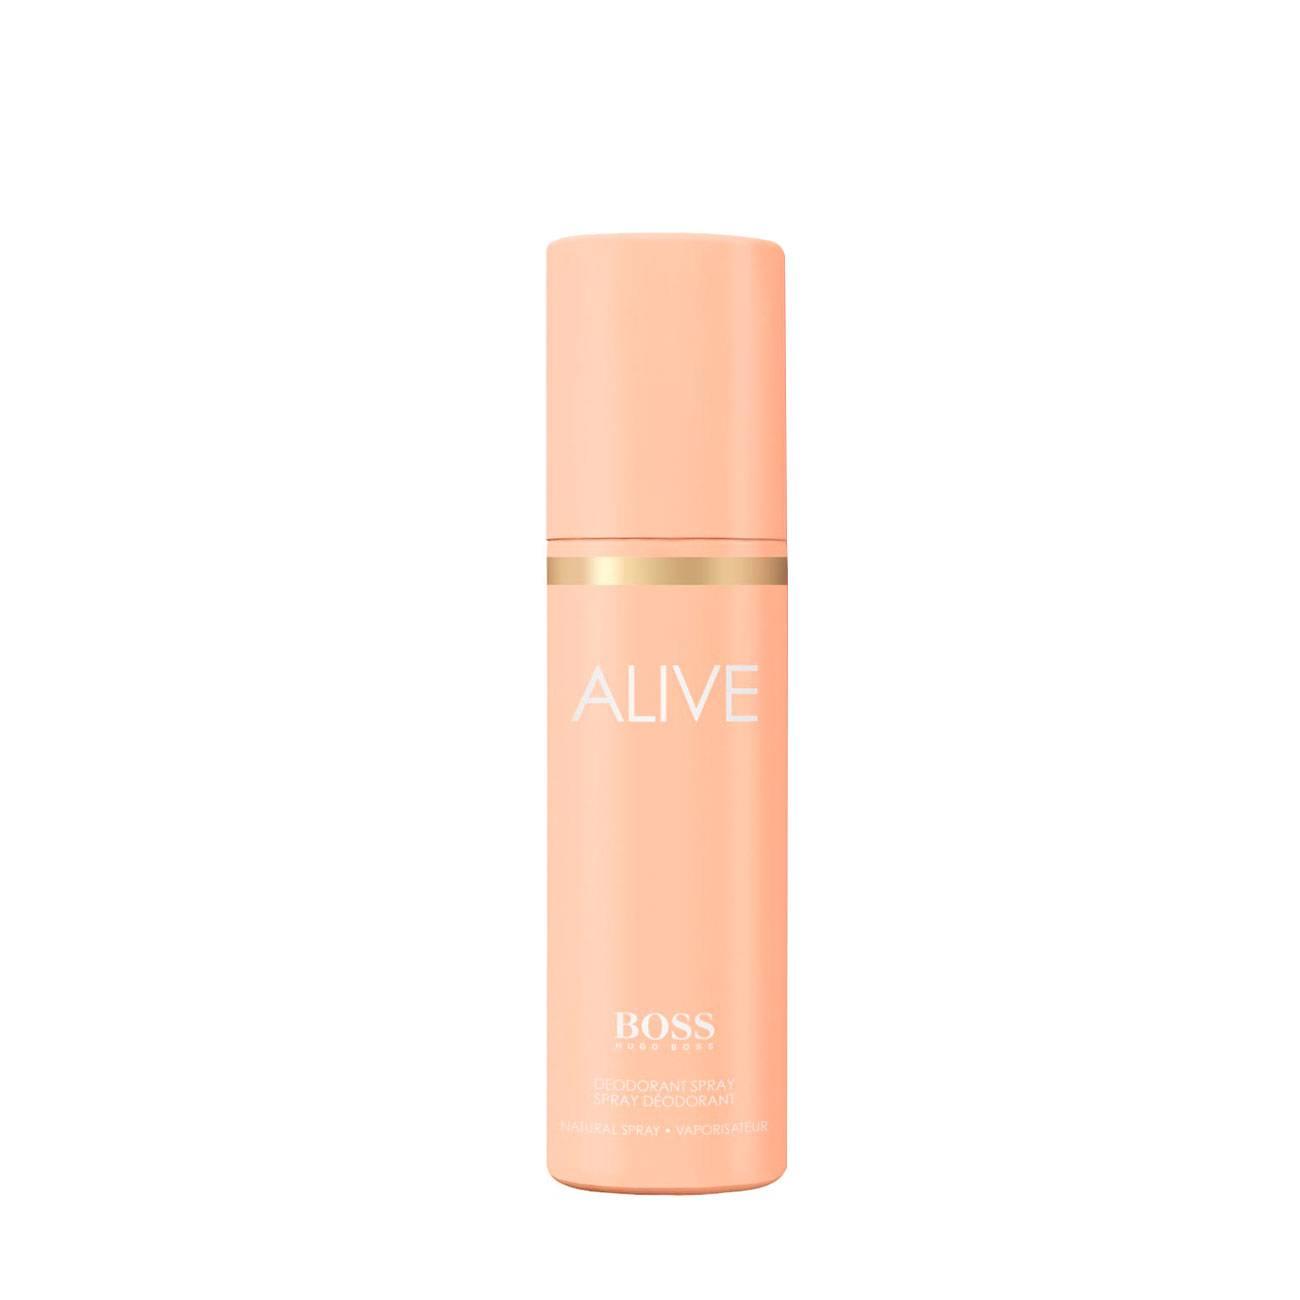 Alive Deodorant Spray 100ml